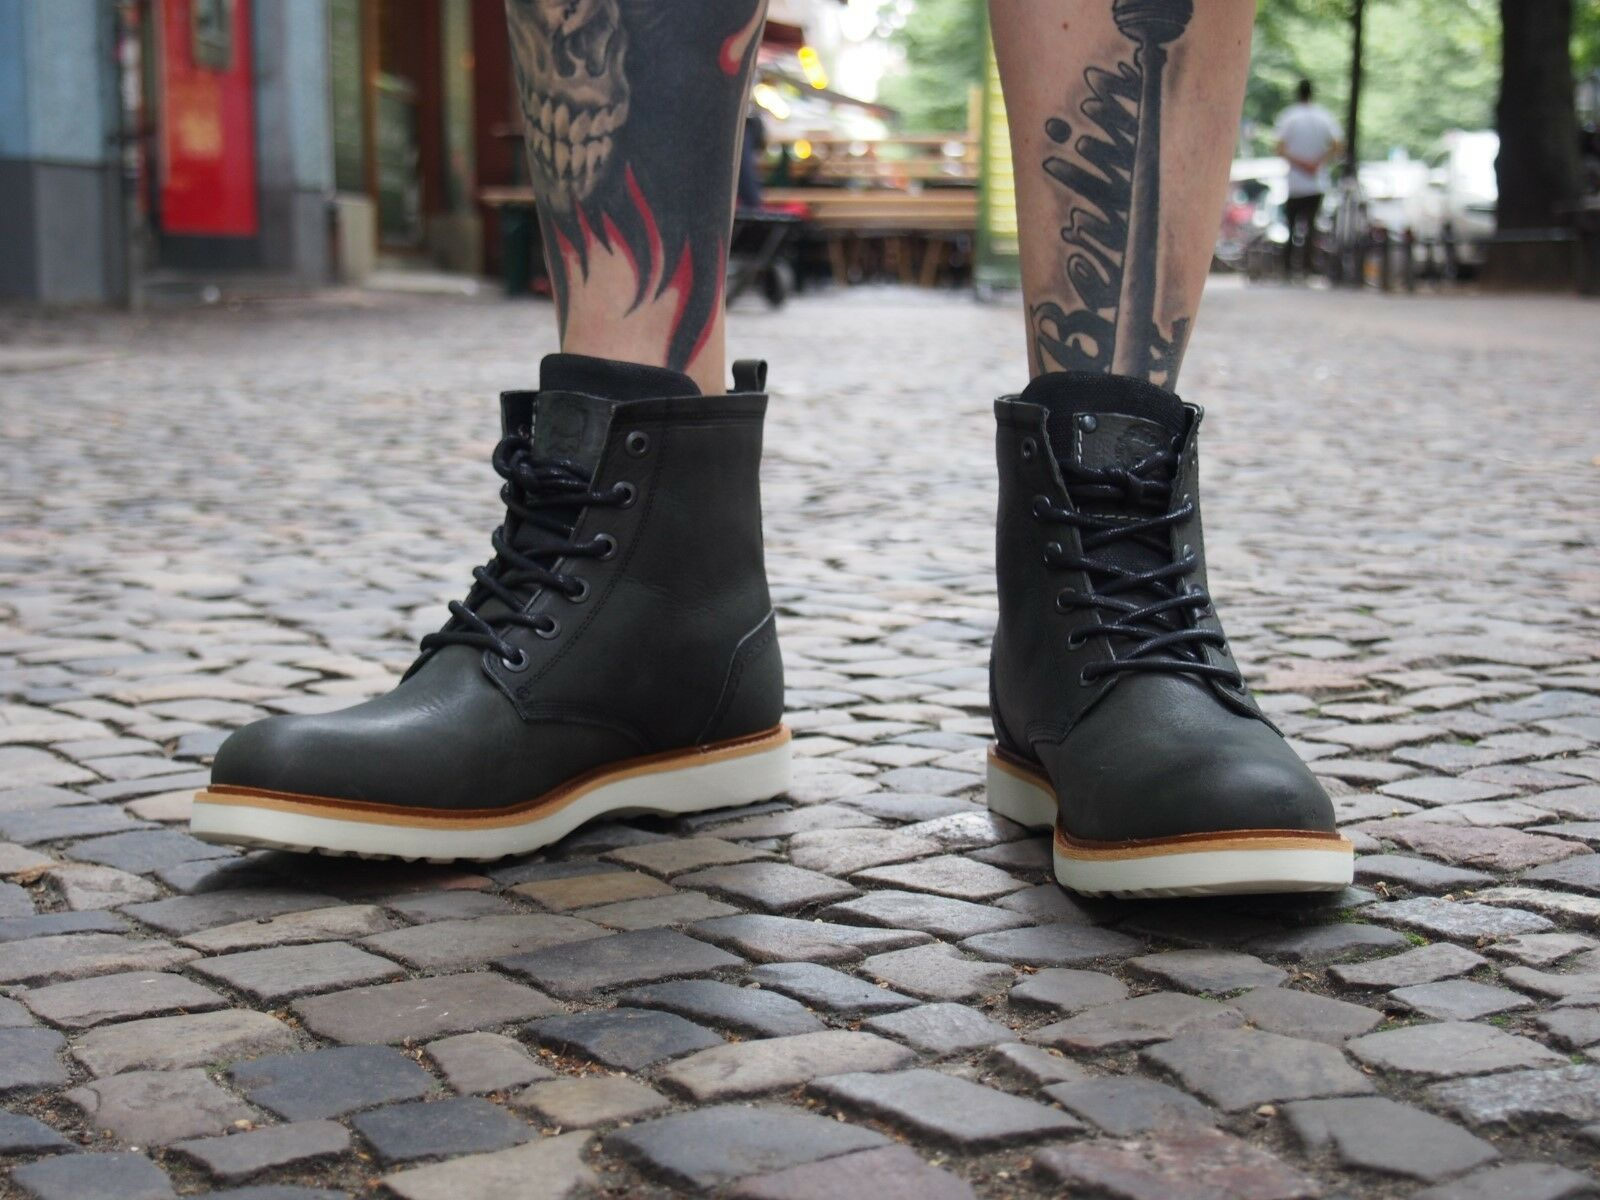 Bullboxer Schuh Stiefel 07 194 dunkelgrün Herrenschuhe Stiefel Schuh Echtleder Winterschuh NEU 0f331d